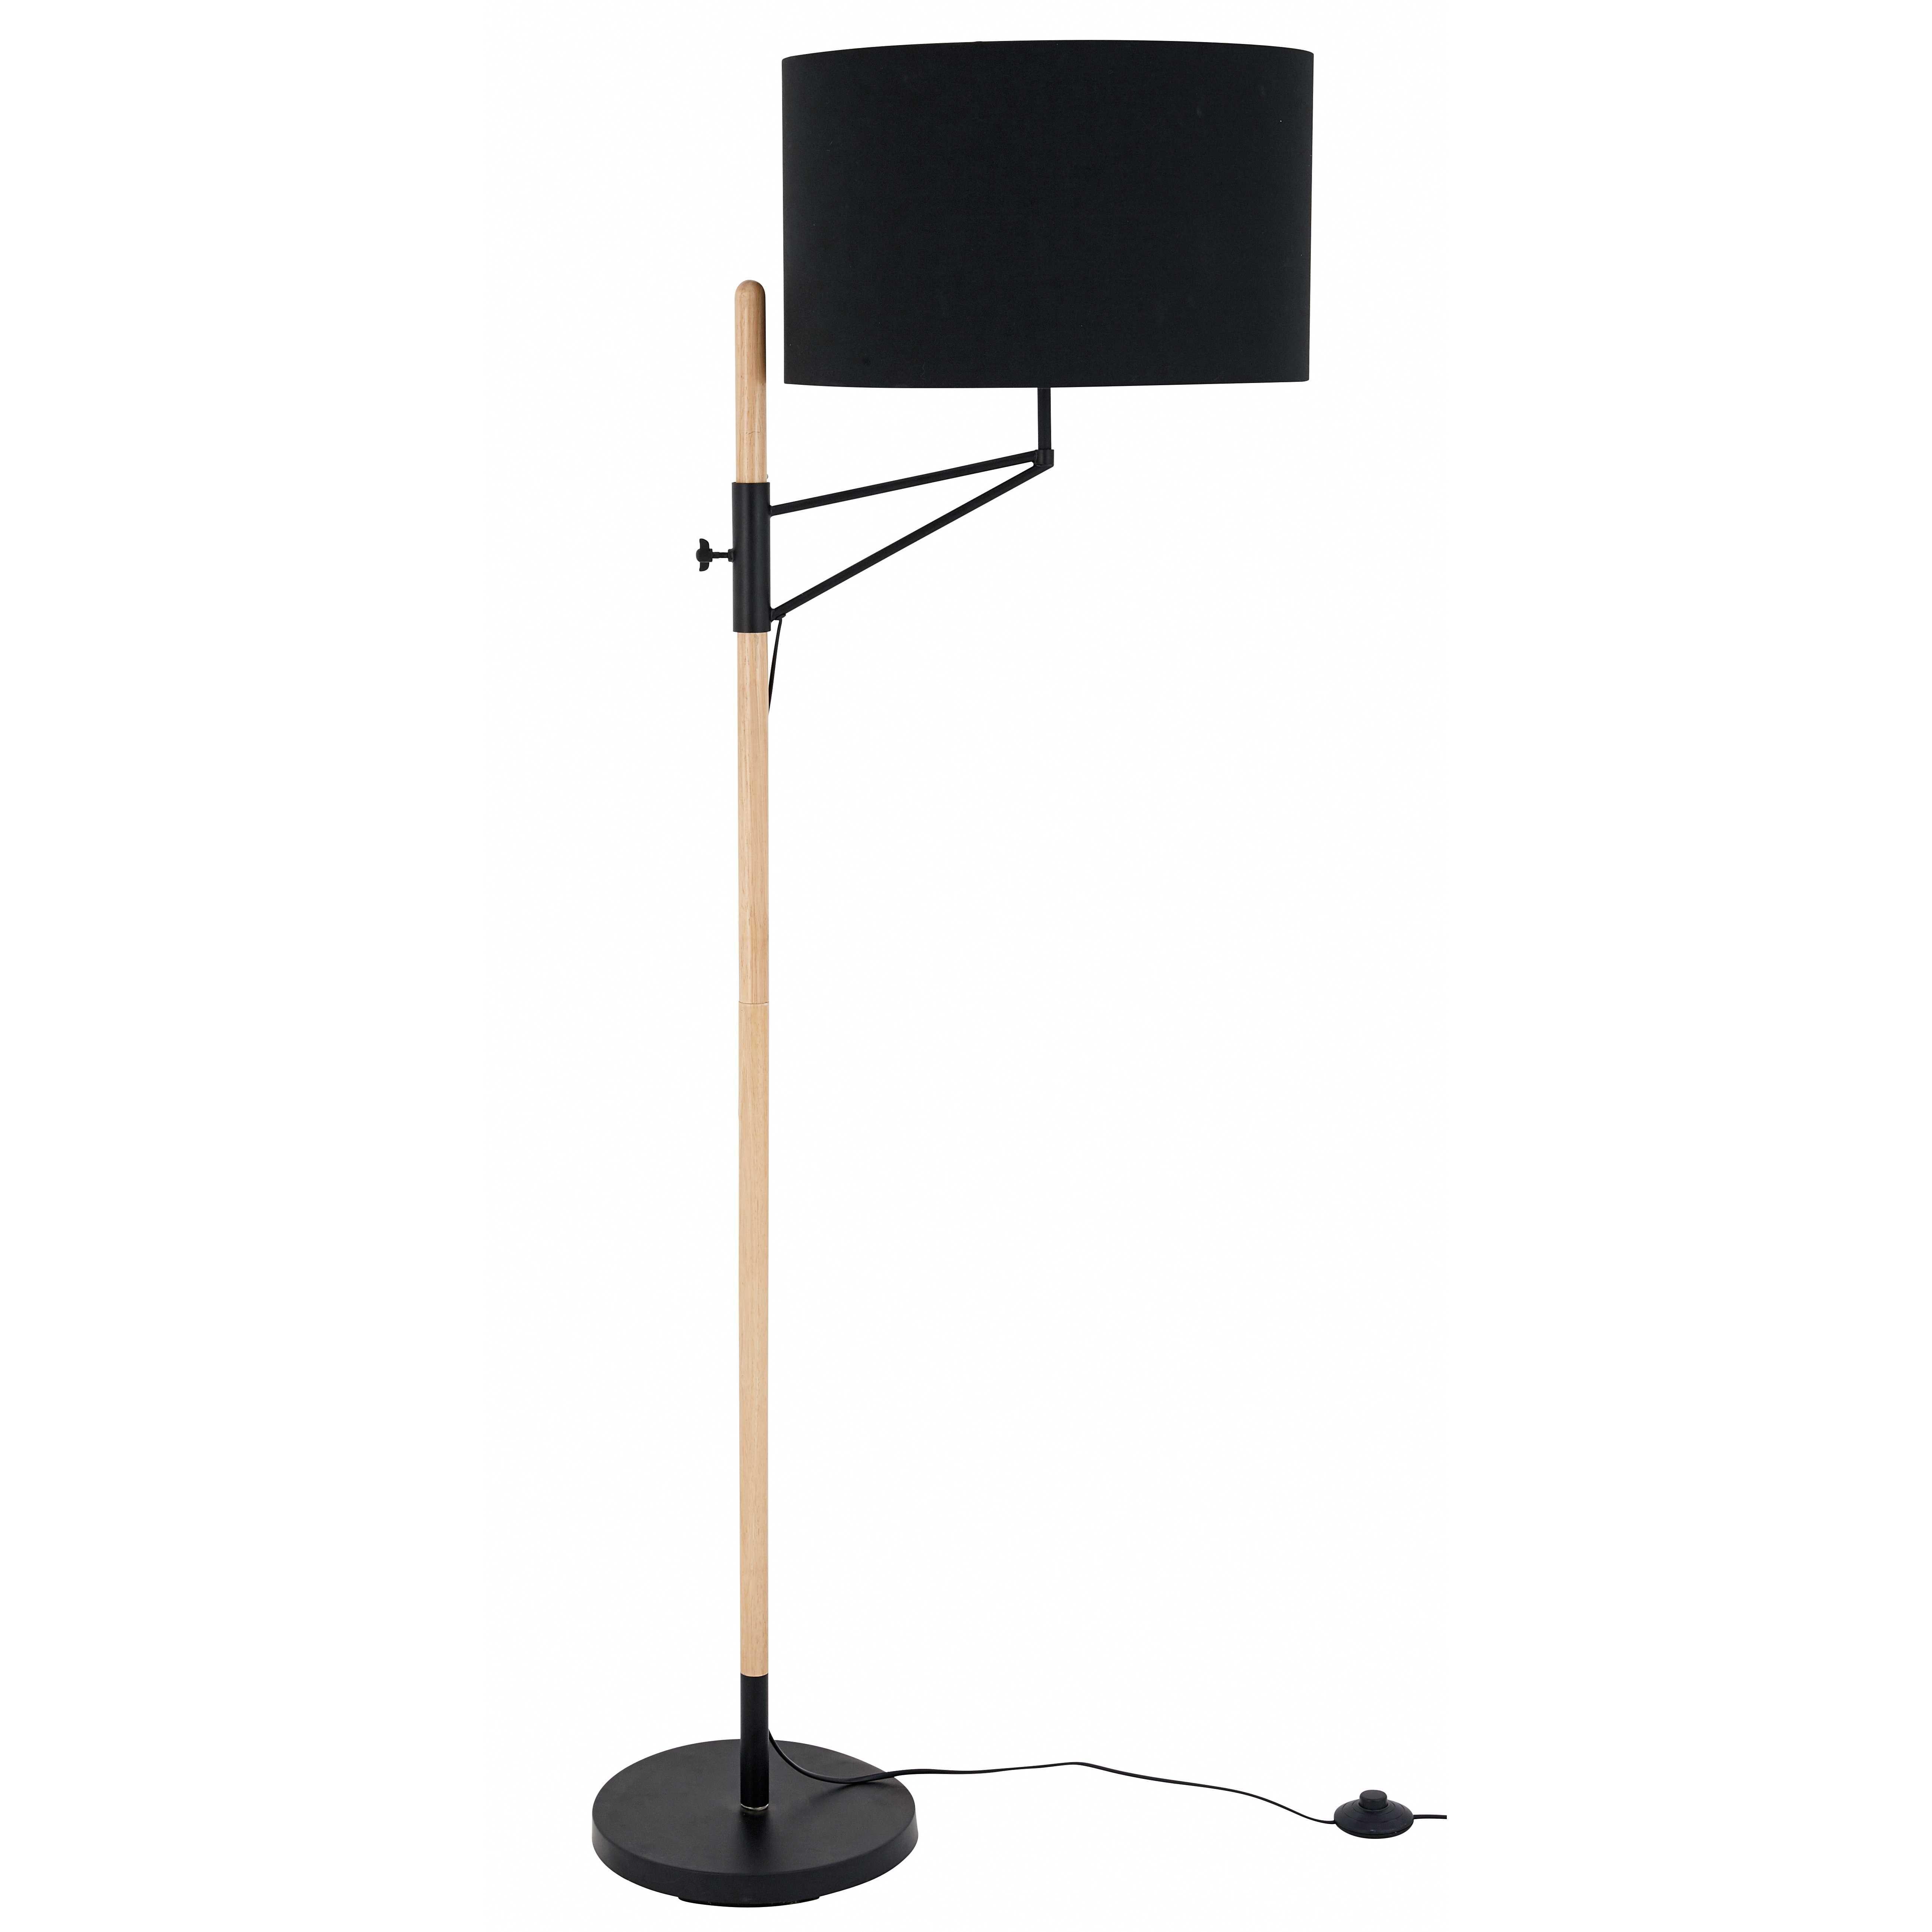 Stehlampe Aus Schwarzem Metall H 152cm Metal Noir Lampadaire